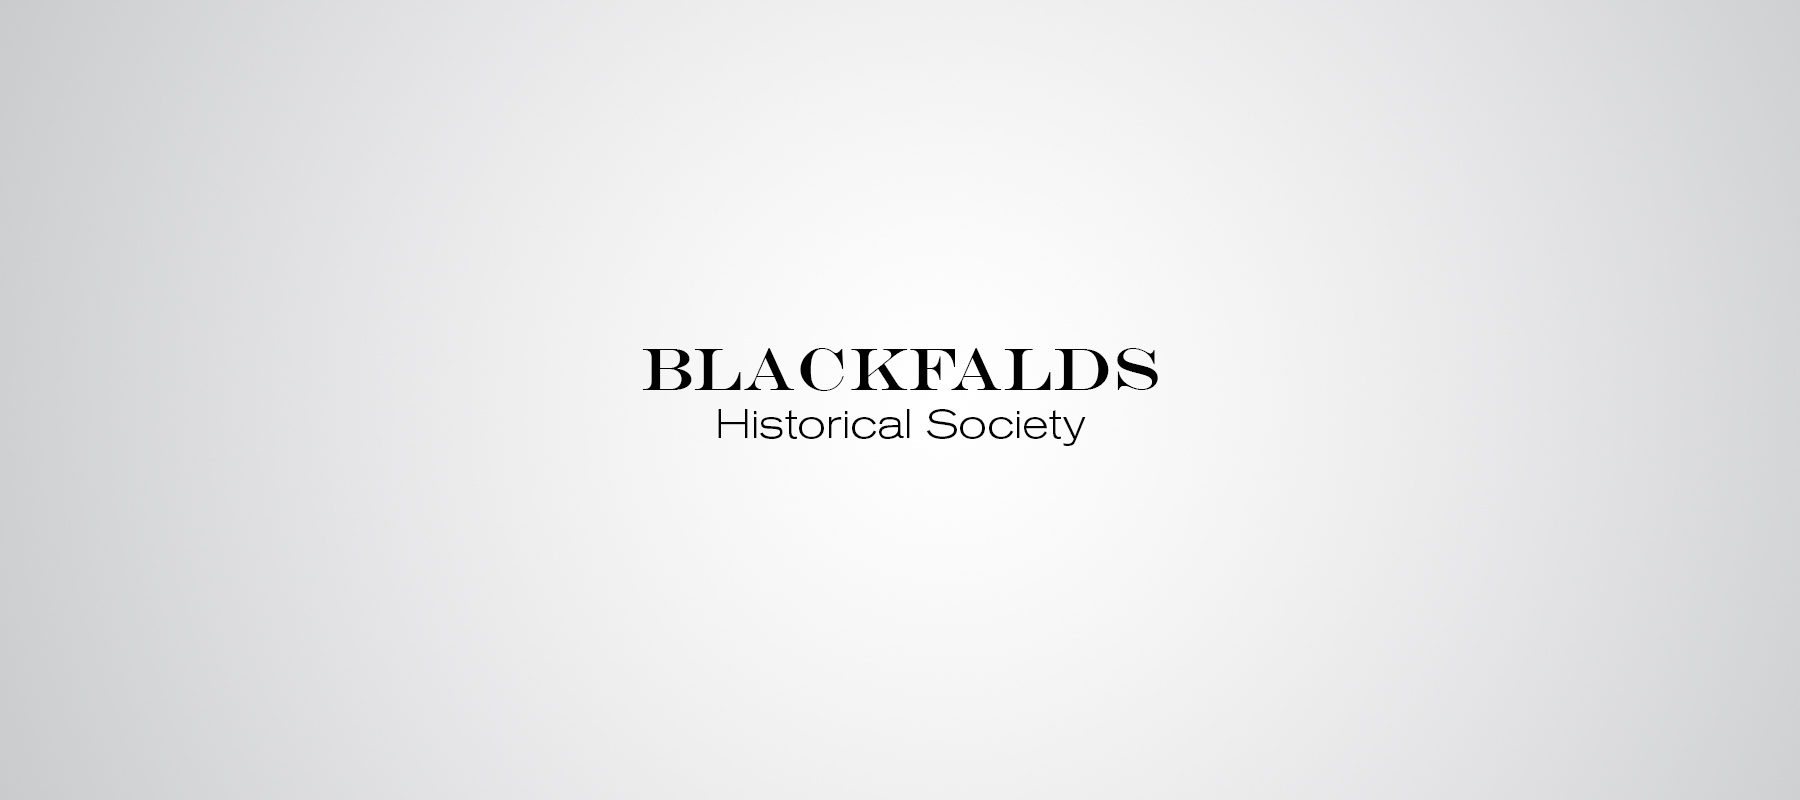 CR_Logos_Blackfalds_1800x800_work.jpg